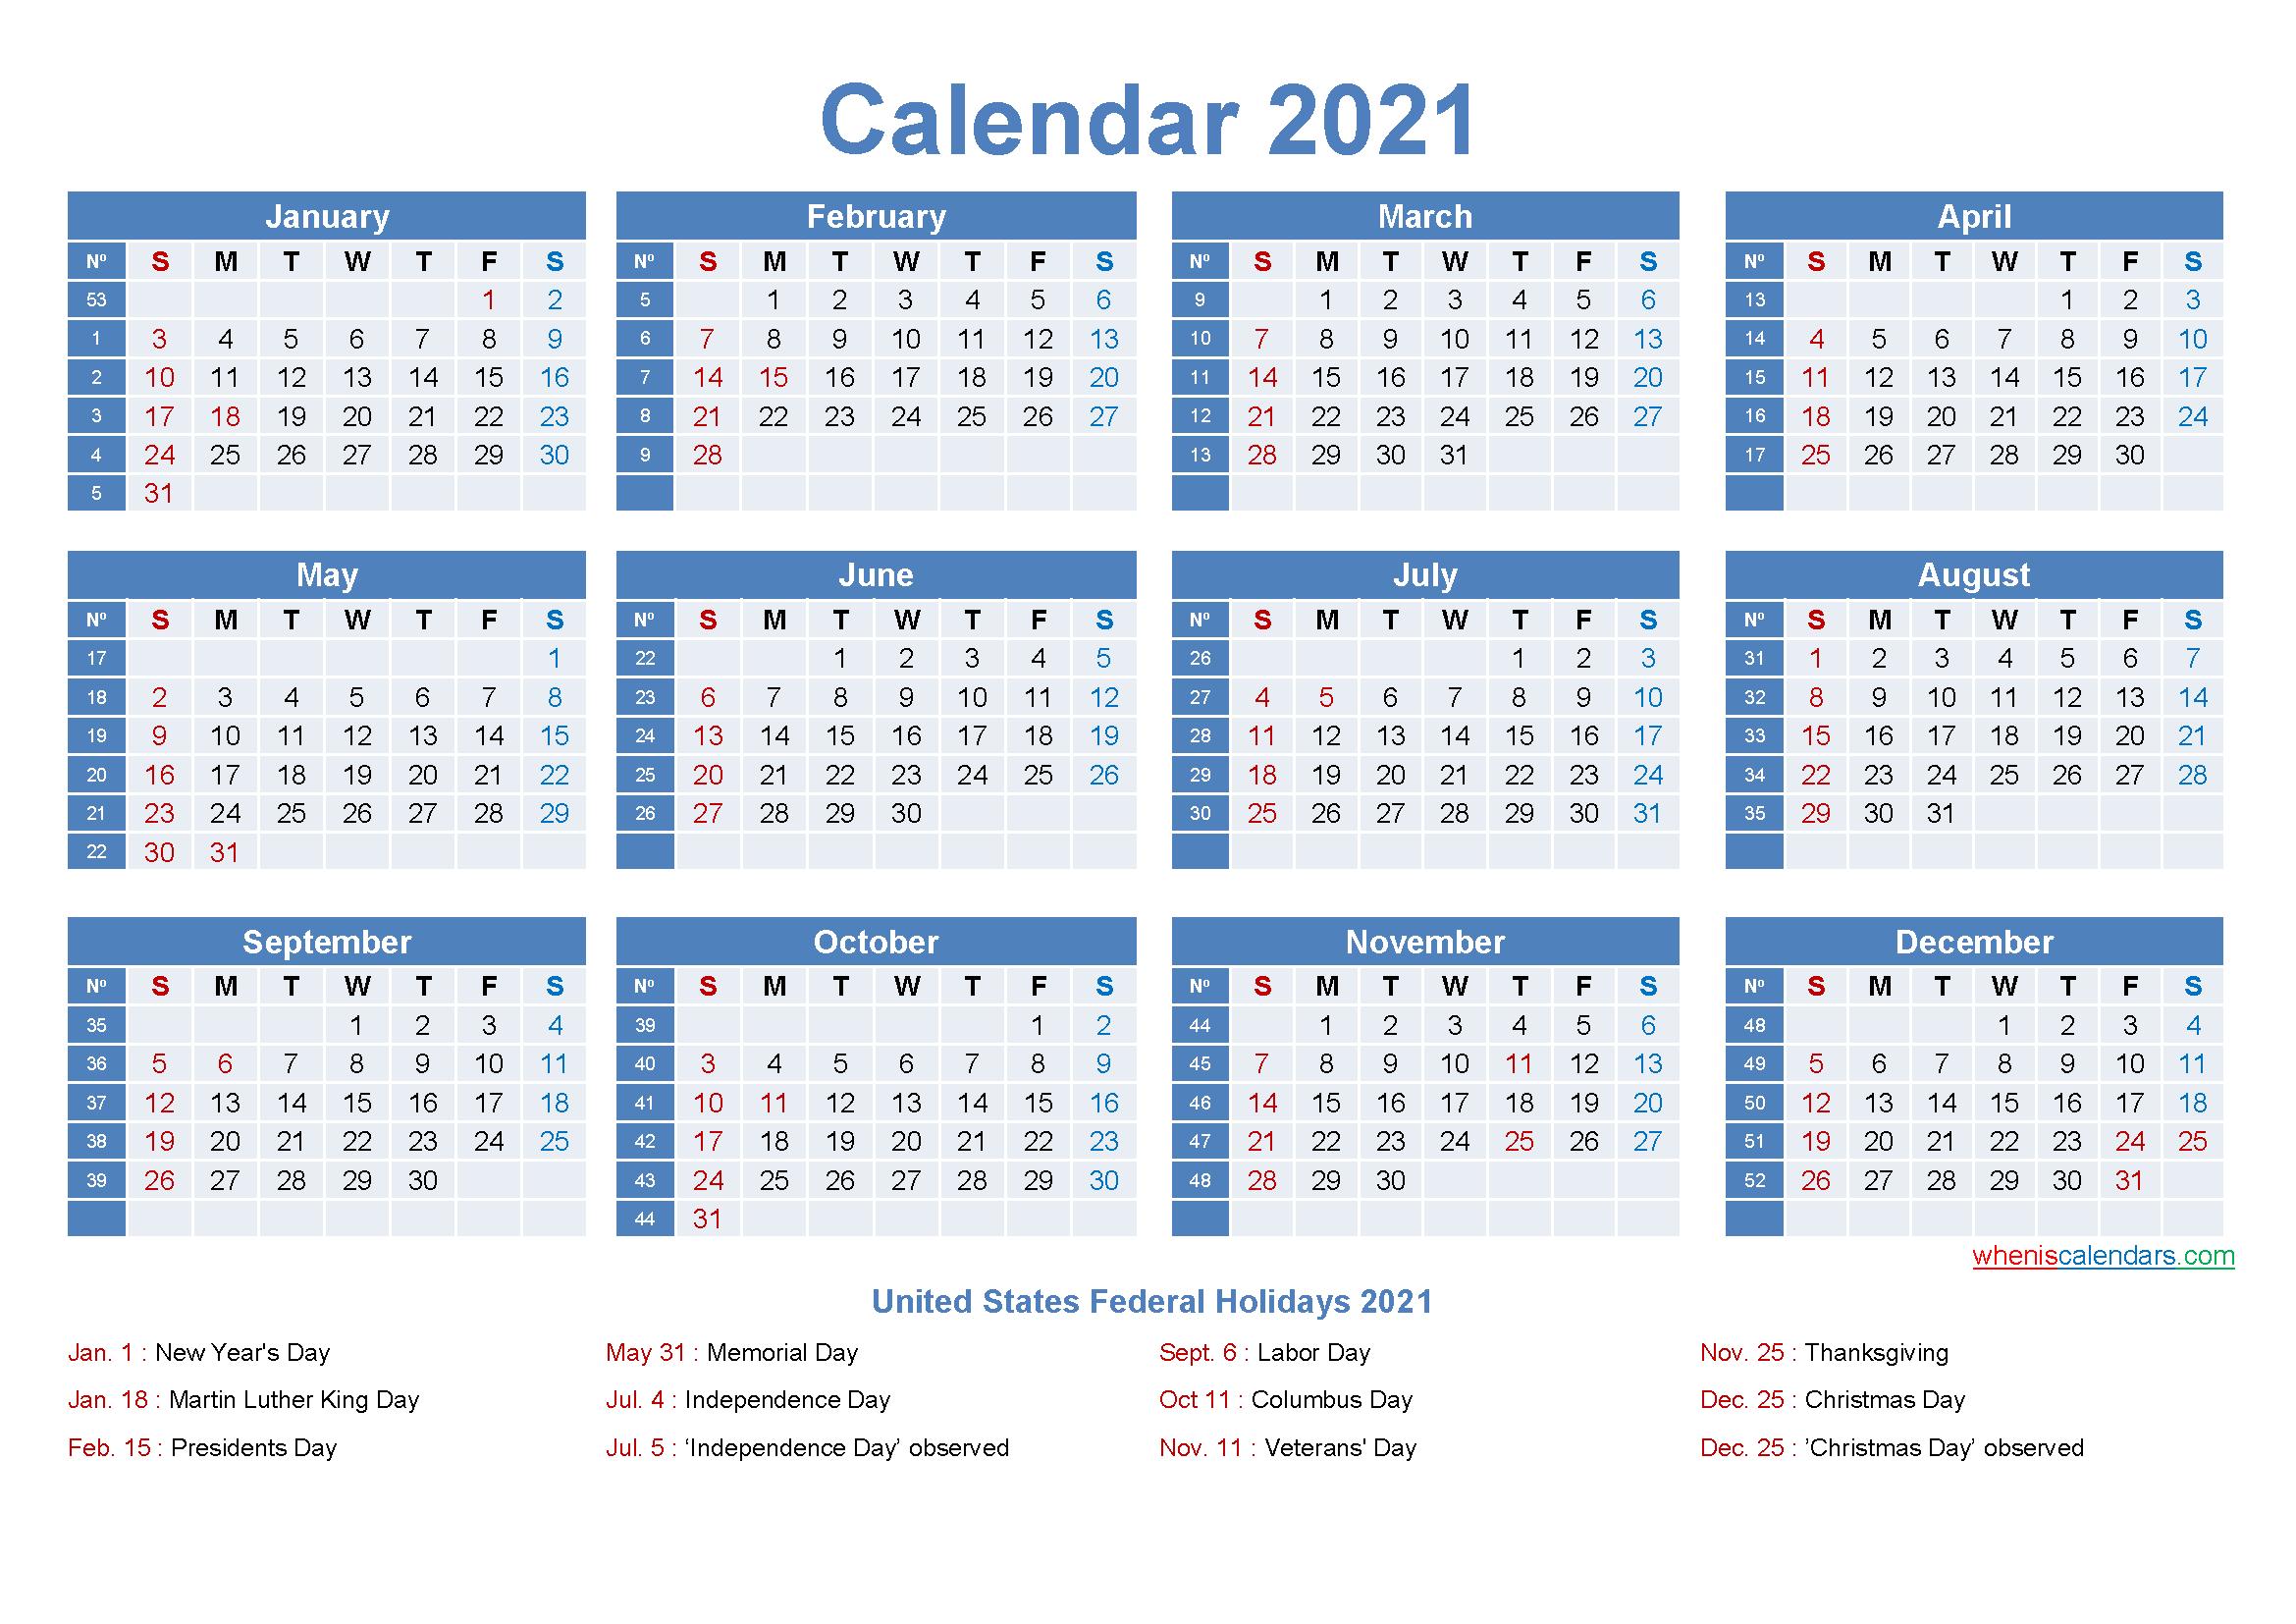 Editable Printable Calendar 2021 Word  Template No.ep21Y8 throughout Printable 3 Months At A Time Calendar 2021